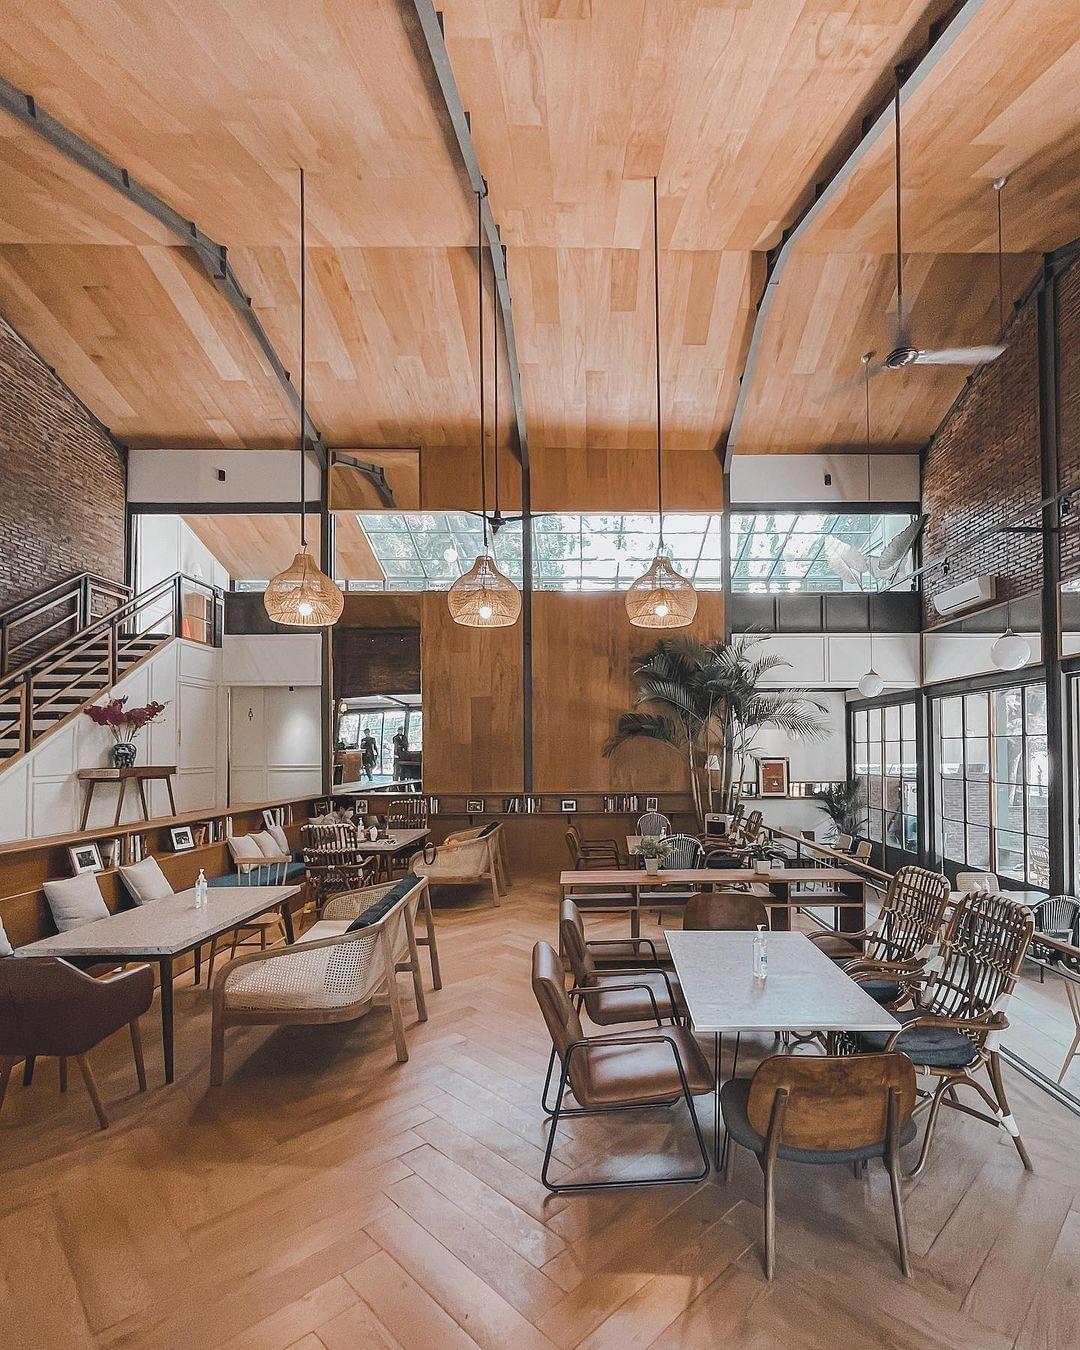 Lot 9 Satrio Cafe